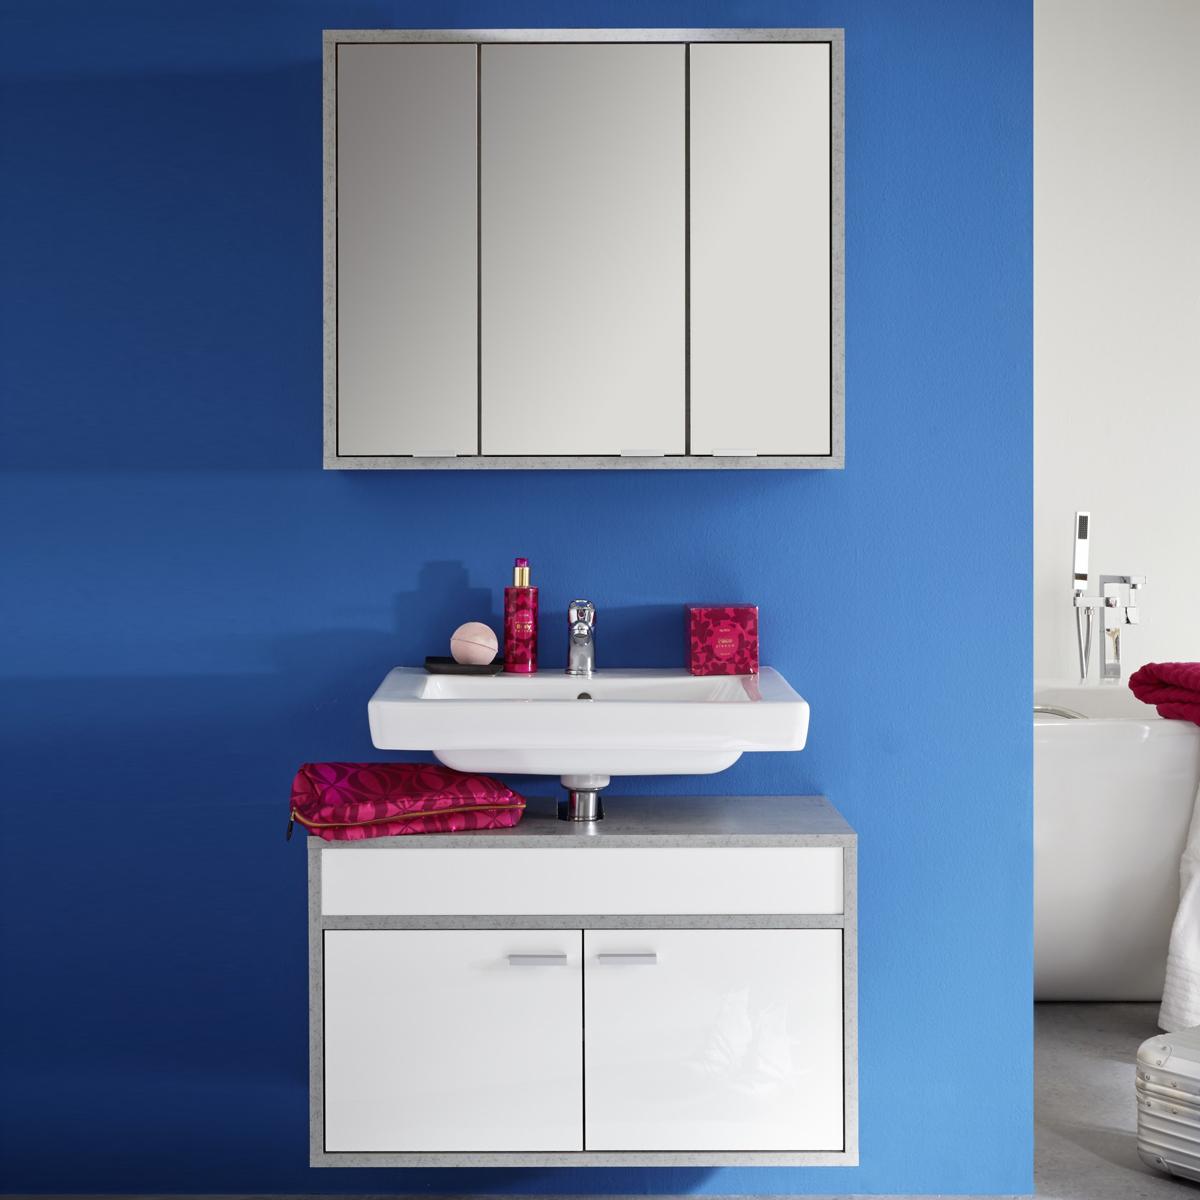 badezimmer set spa wei glanz beton industry badm bel badschr nke bad ebay. Black Bedroom Furniture Sets. Home Design Ideas